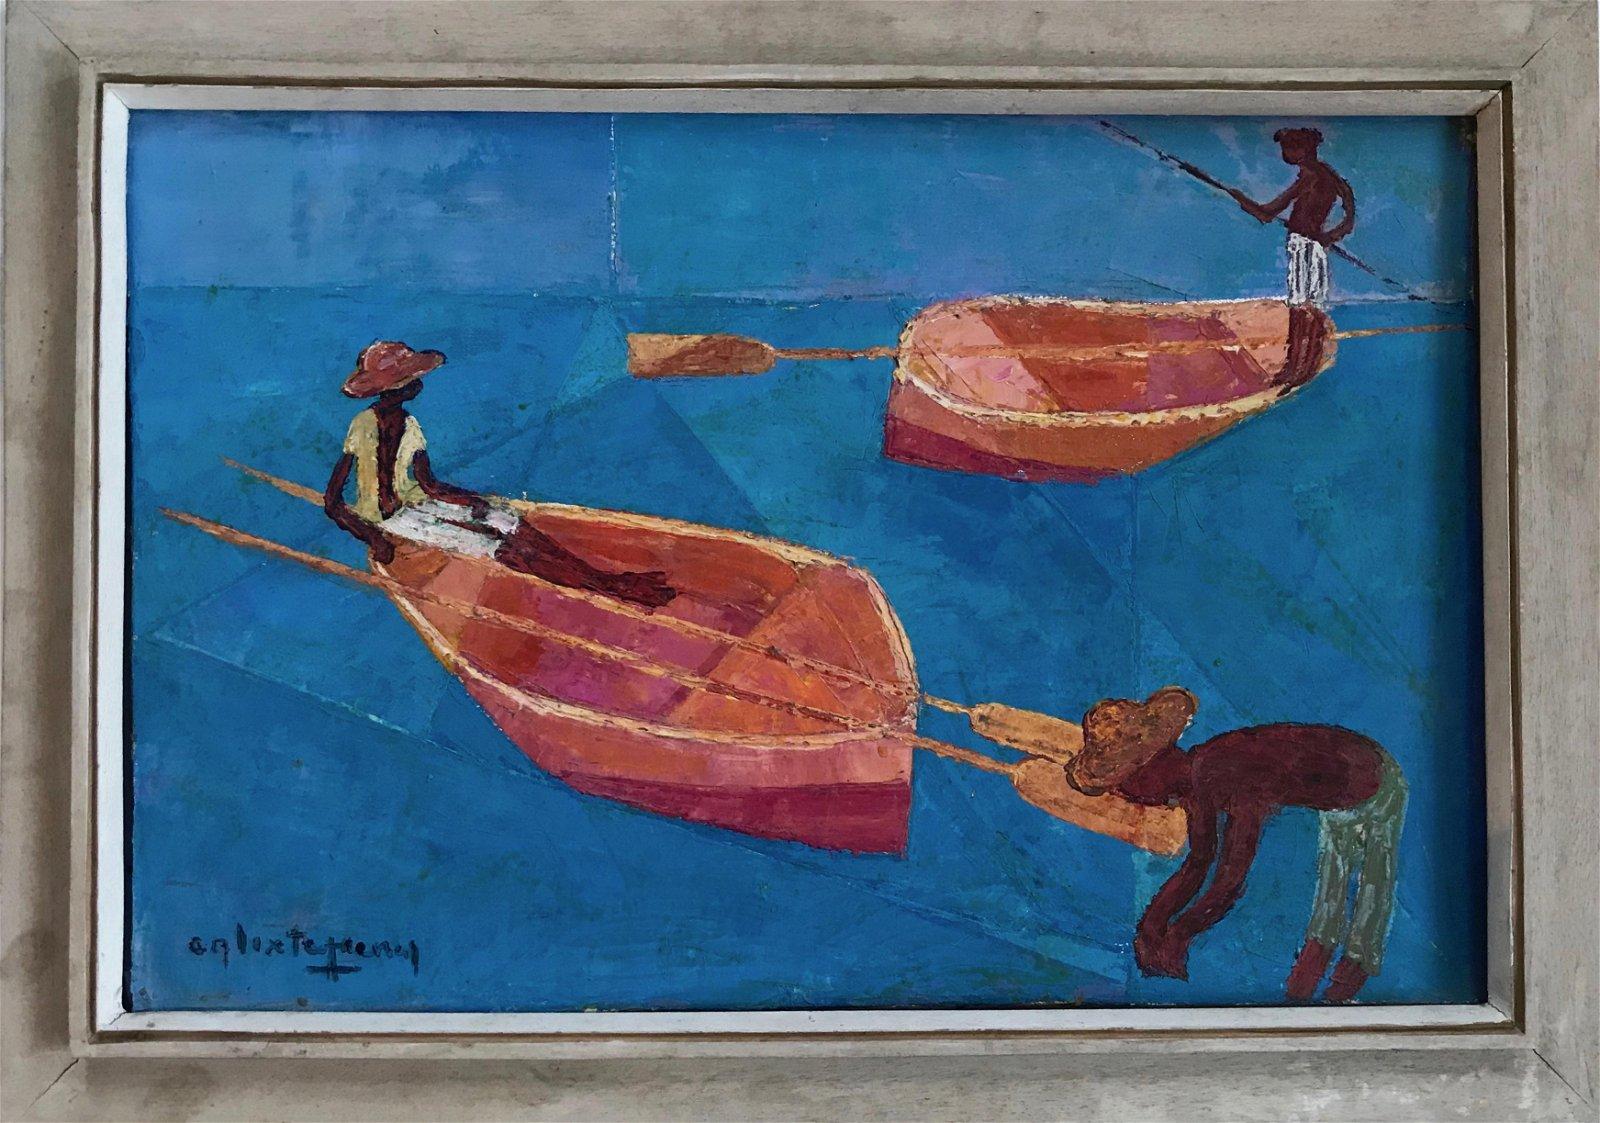 Henri Calixte (Haitian,1933-2010) Oil Painting